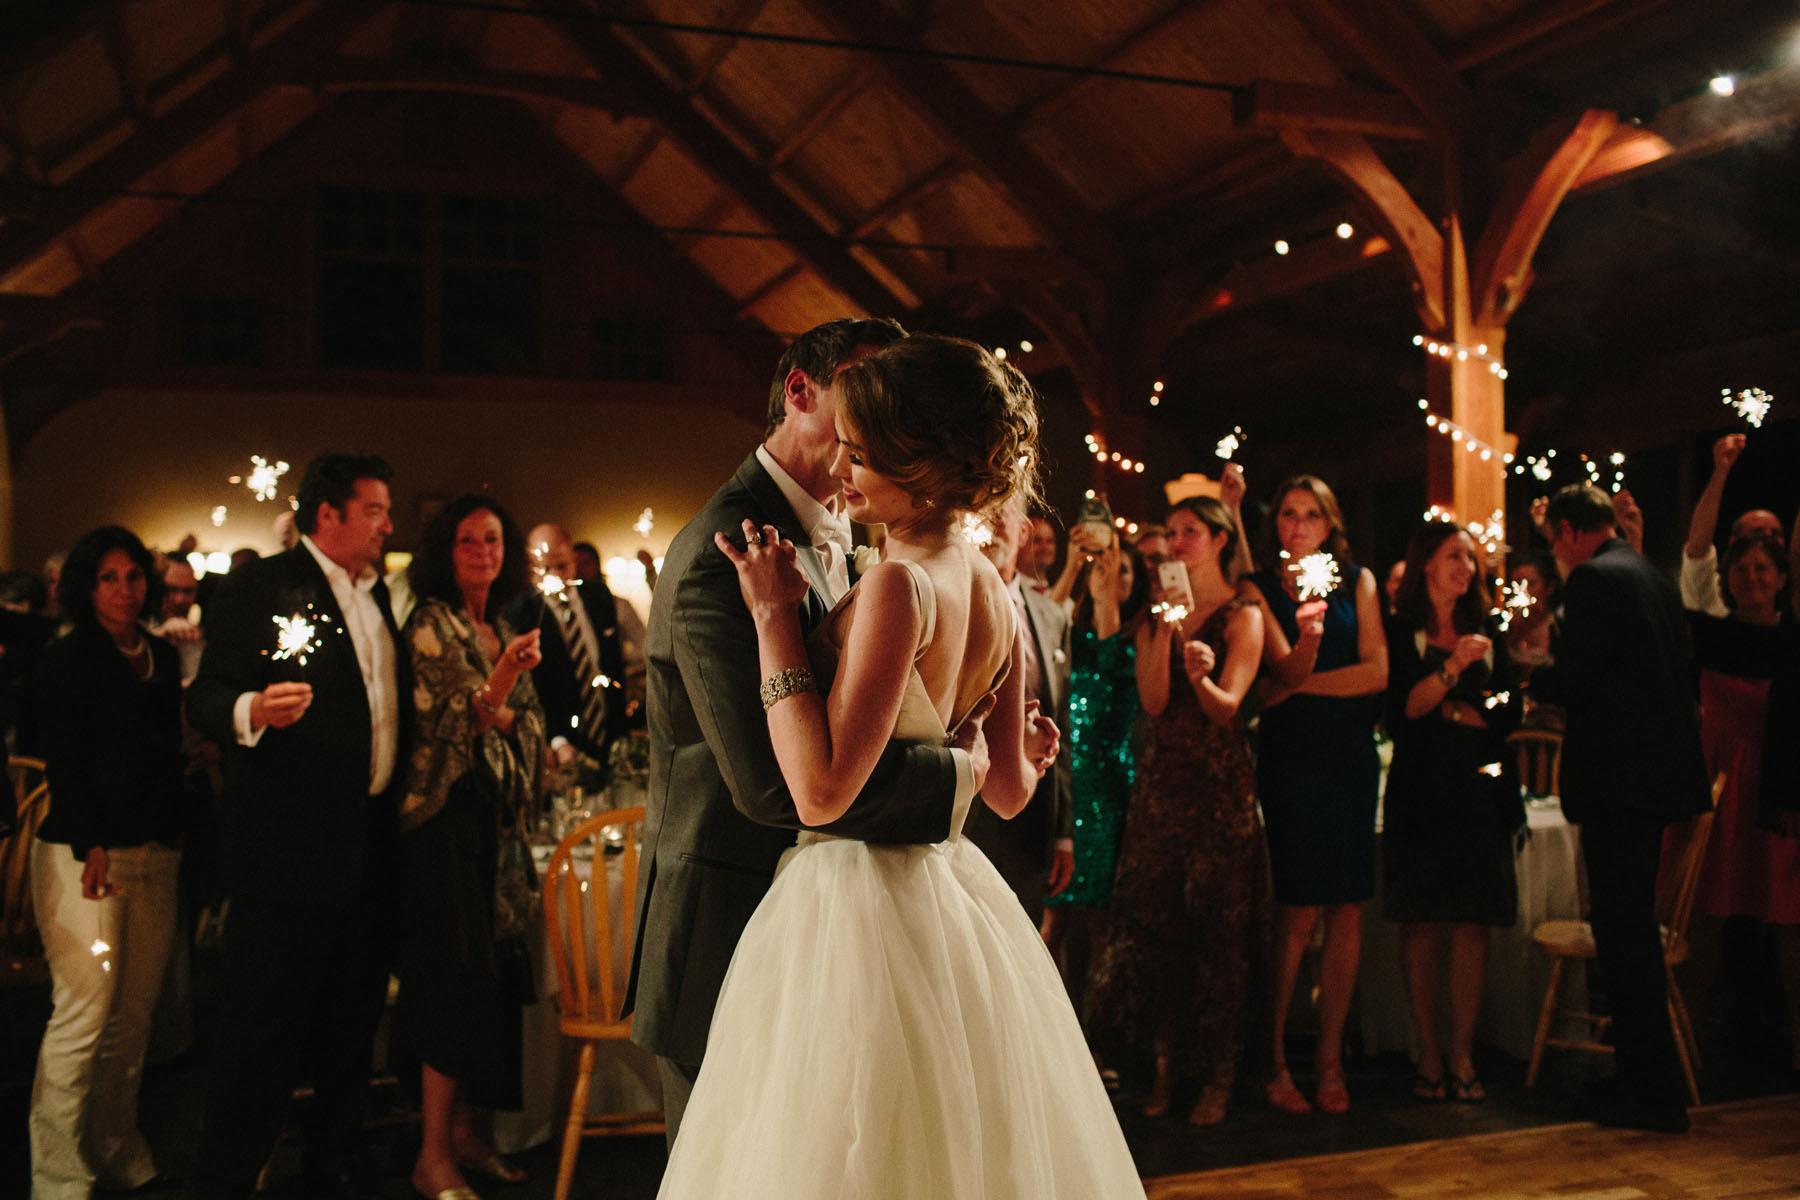 thetis-island-wedding-photographer-rp-rn-202.jpg